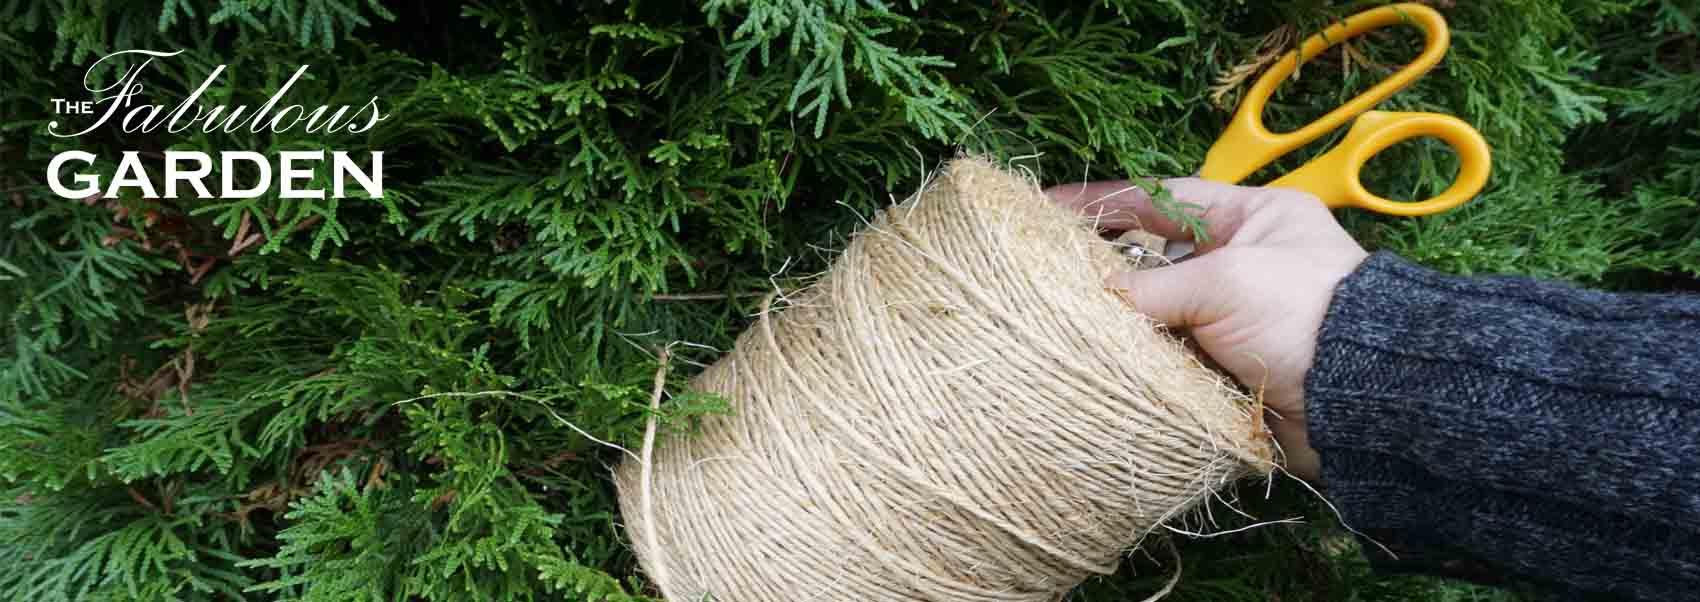 Preventing Snow & Ice Damage to Cedars